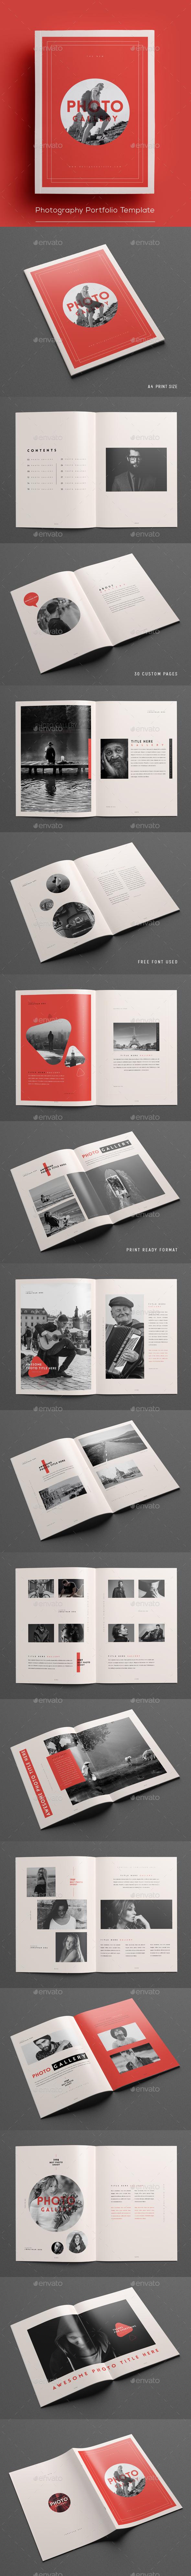 GraphicRiver Photography Portfolio Template 20860581